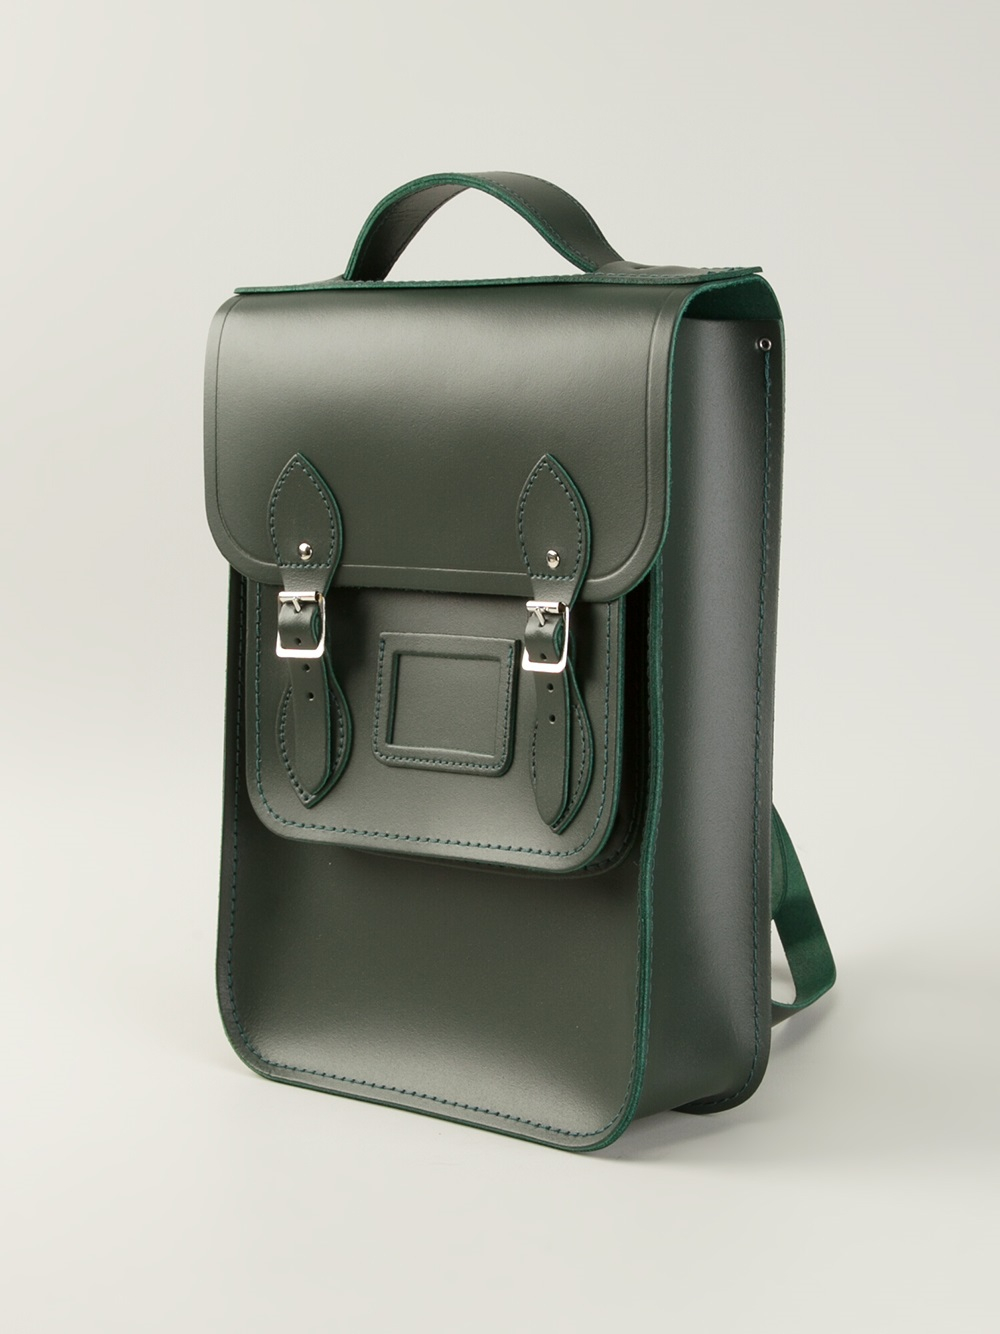 0b1dbae76830d Lyst - Cambridge Satchel Company Raw Cut Leather Backpack in Green